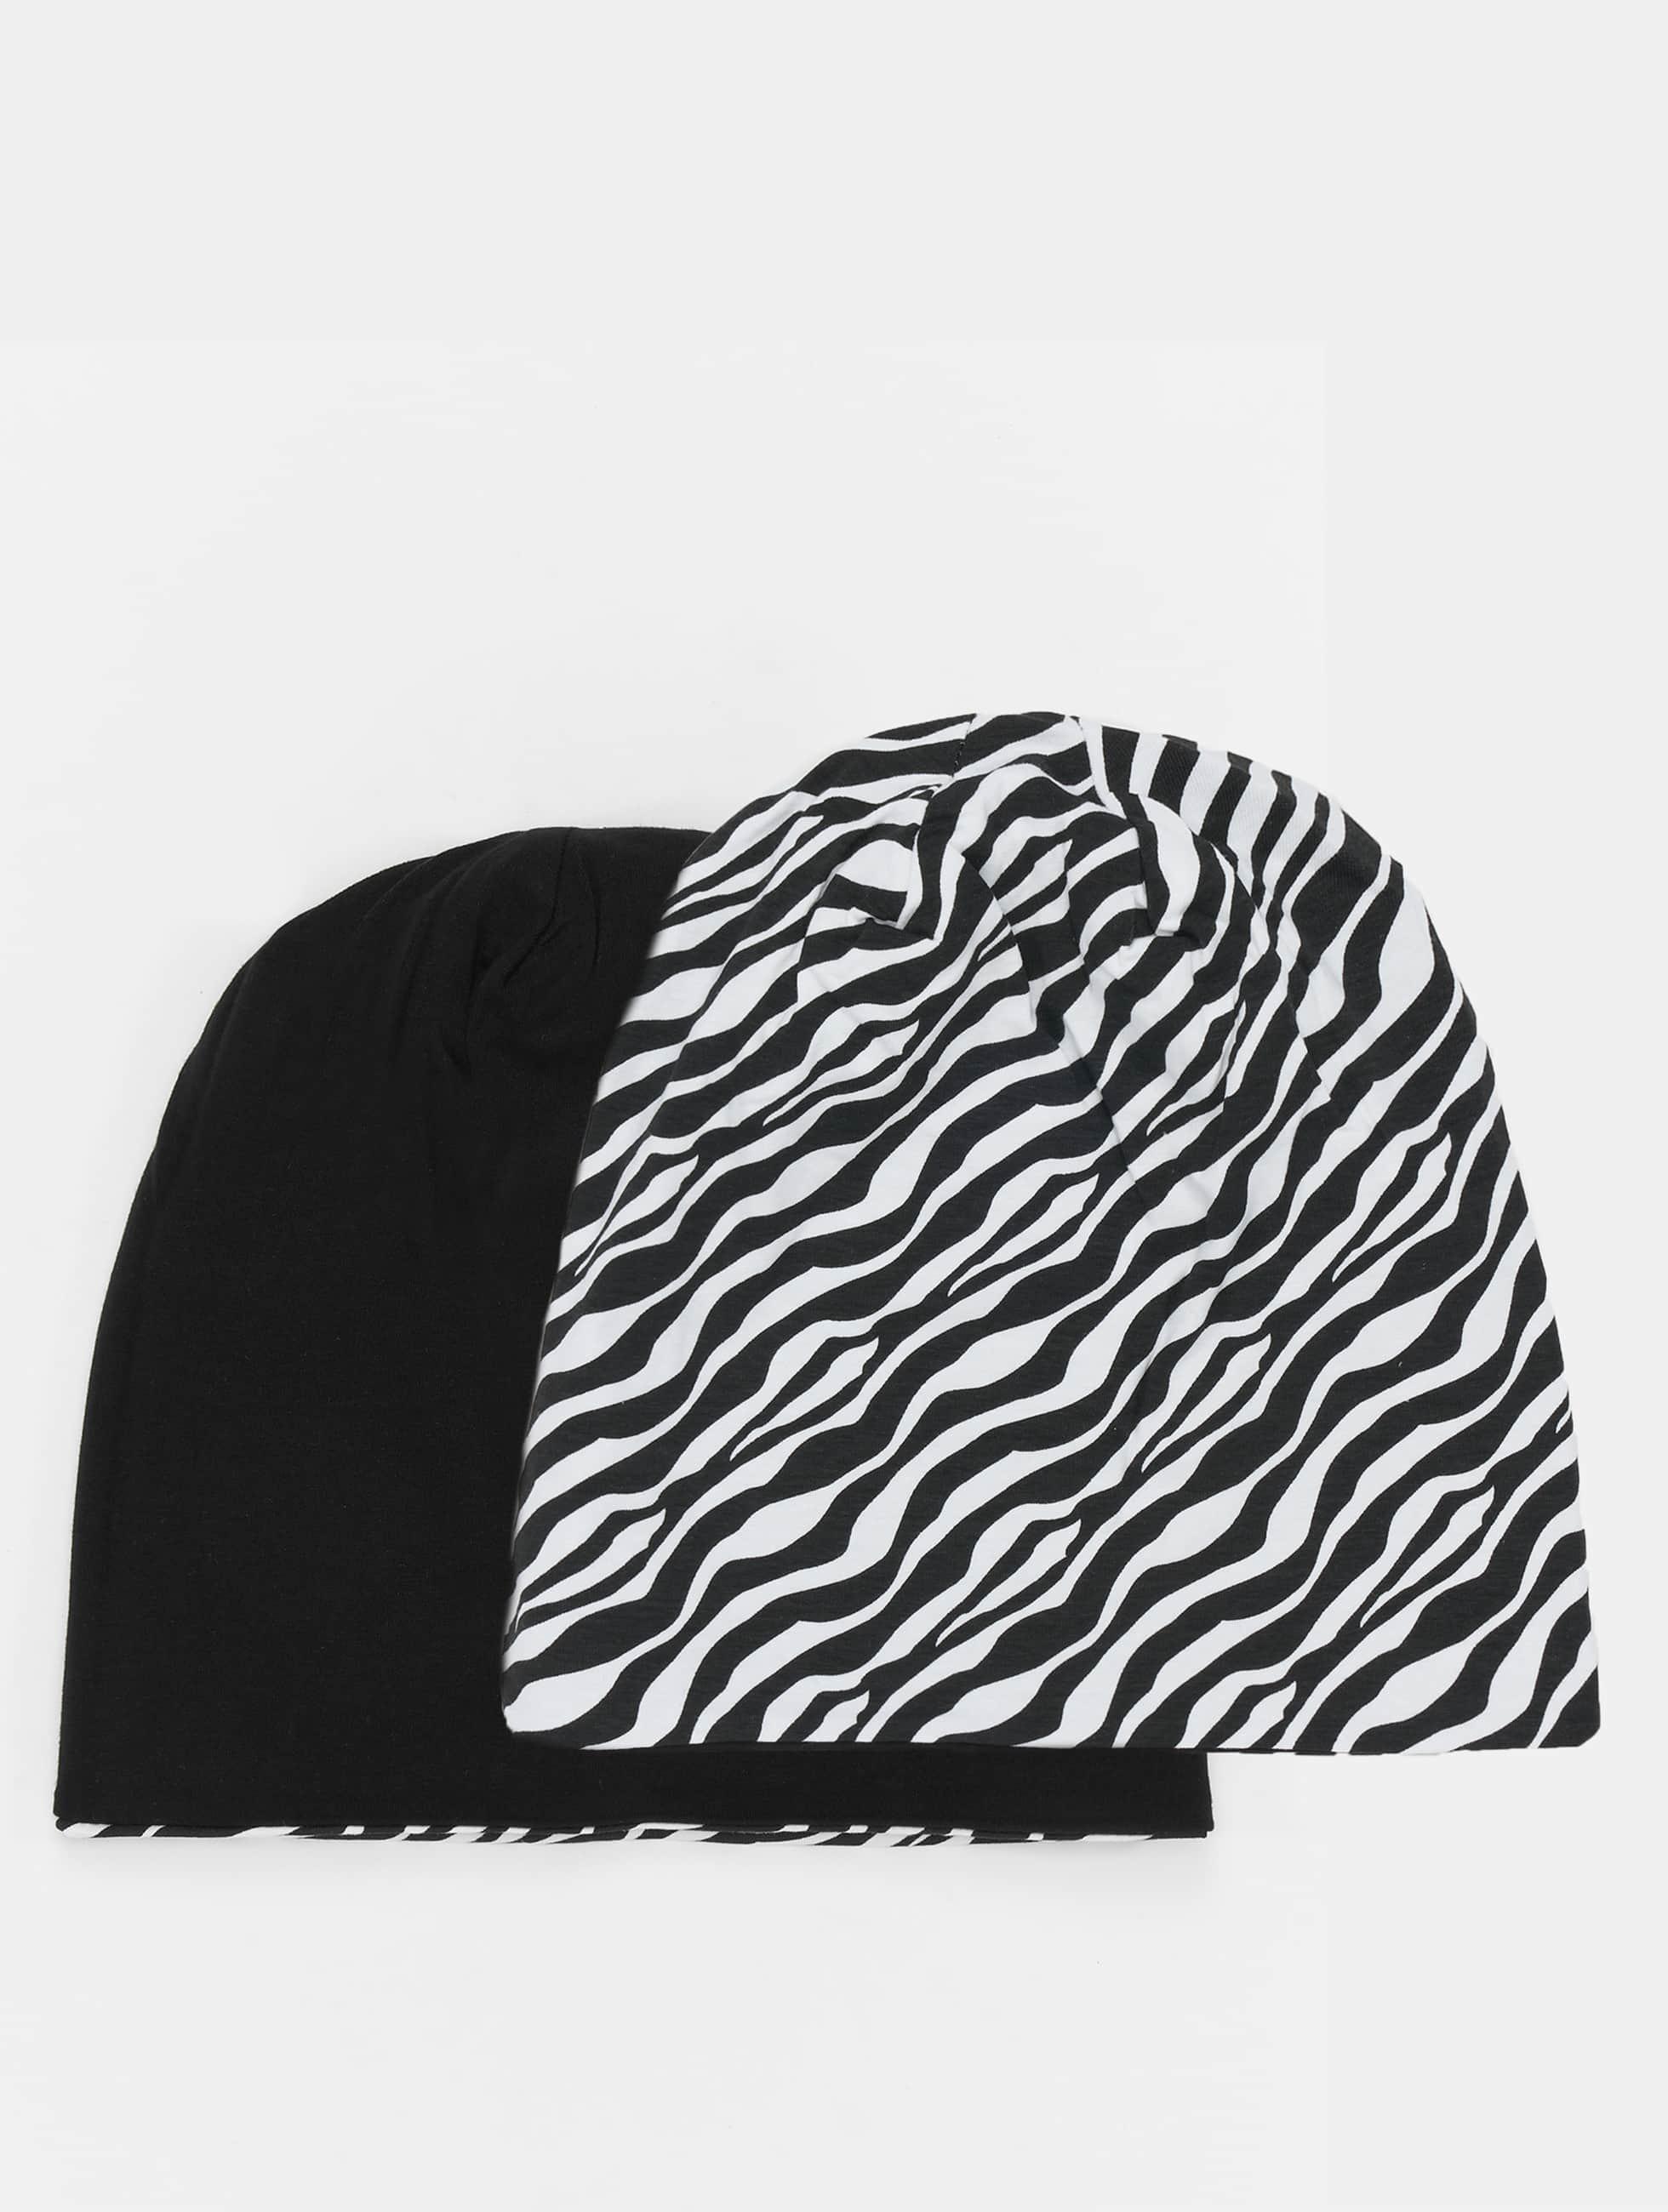 MSTRDS шляпа Printed Jersey черный